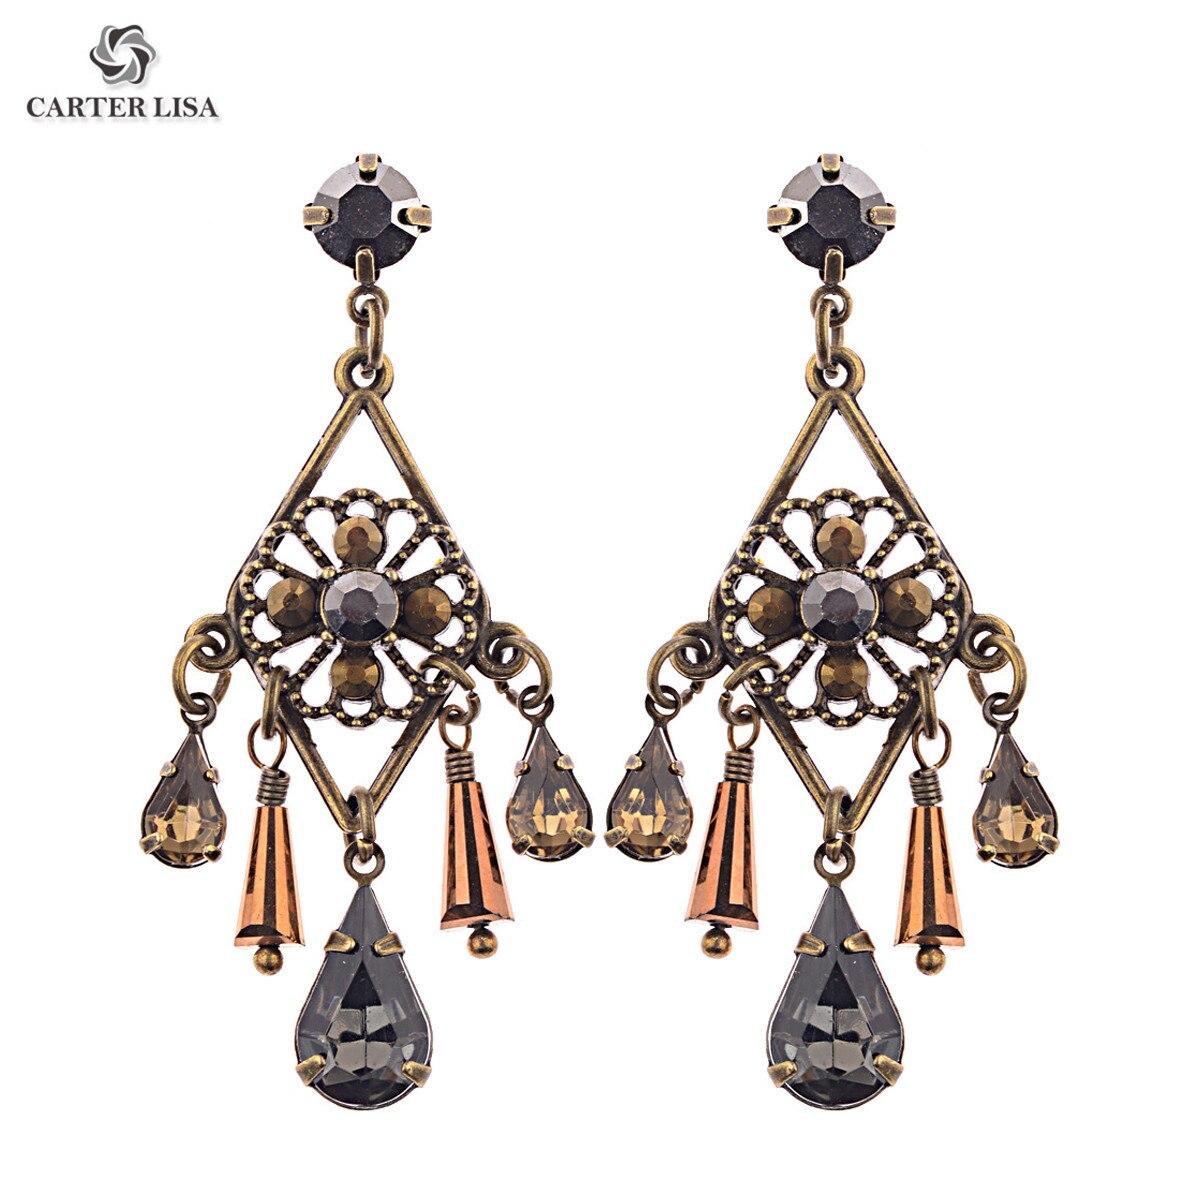 CARTER LISA Vintage Bronze Metal Crystal Chandelier Drop Dangle Earrings Statement Jewelry Ethnic Earrings Oorbellen Brincos